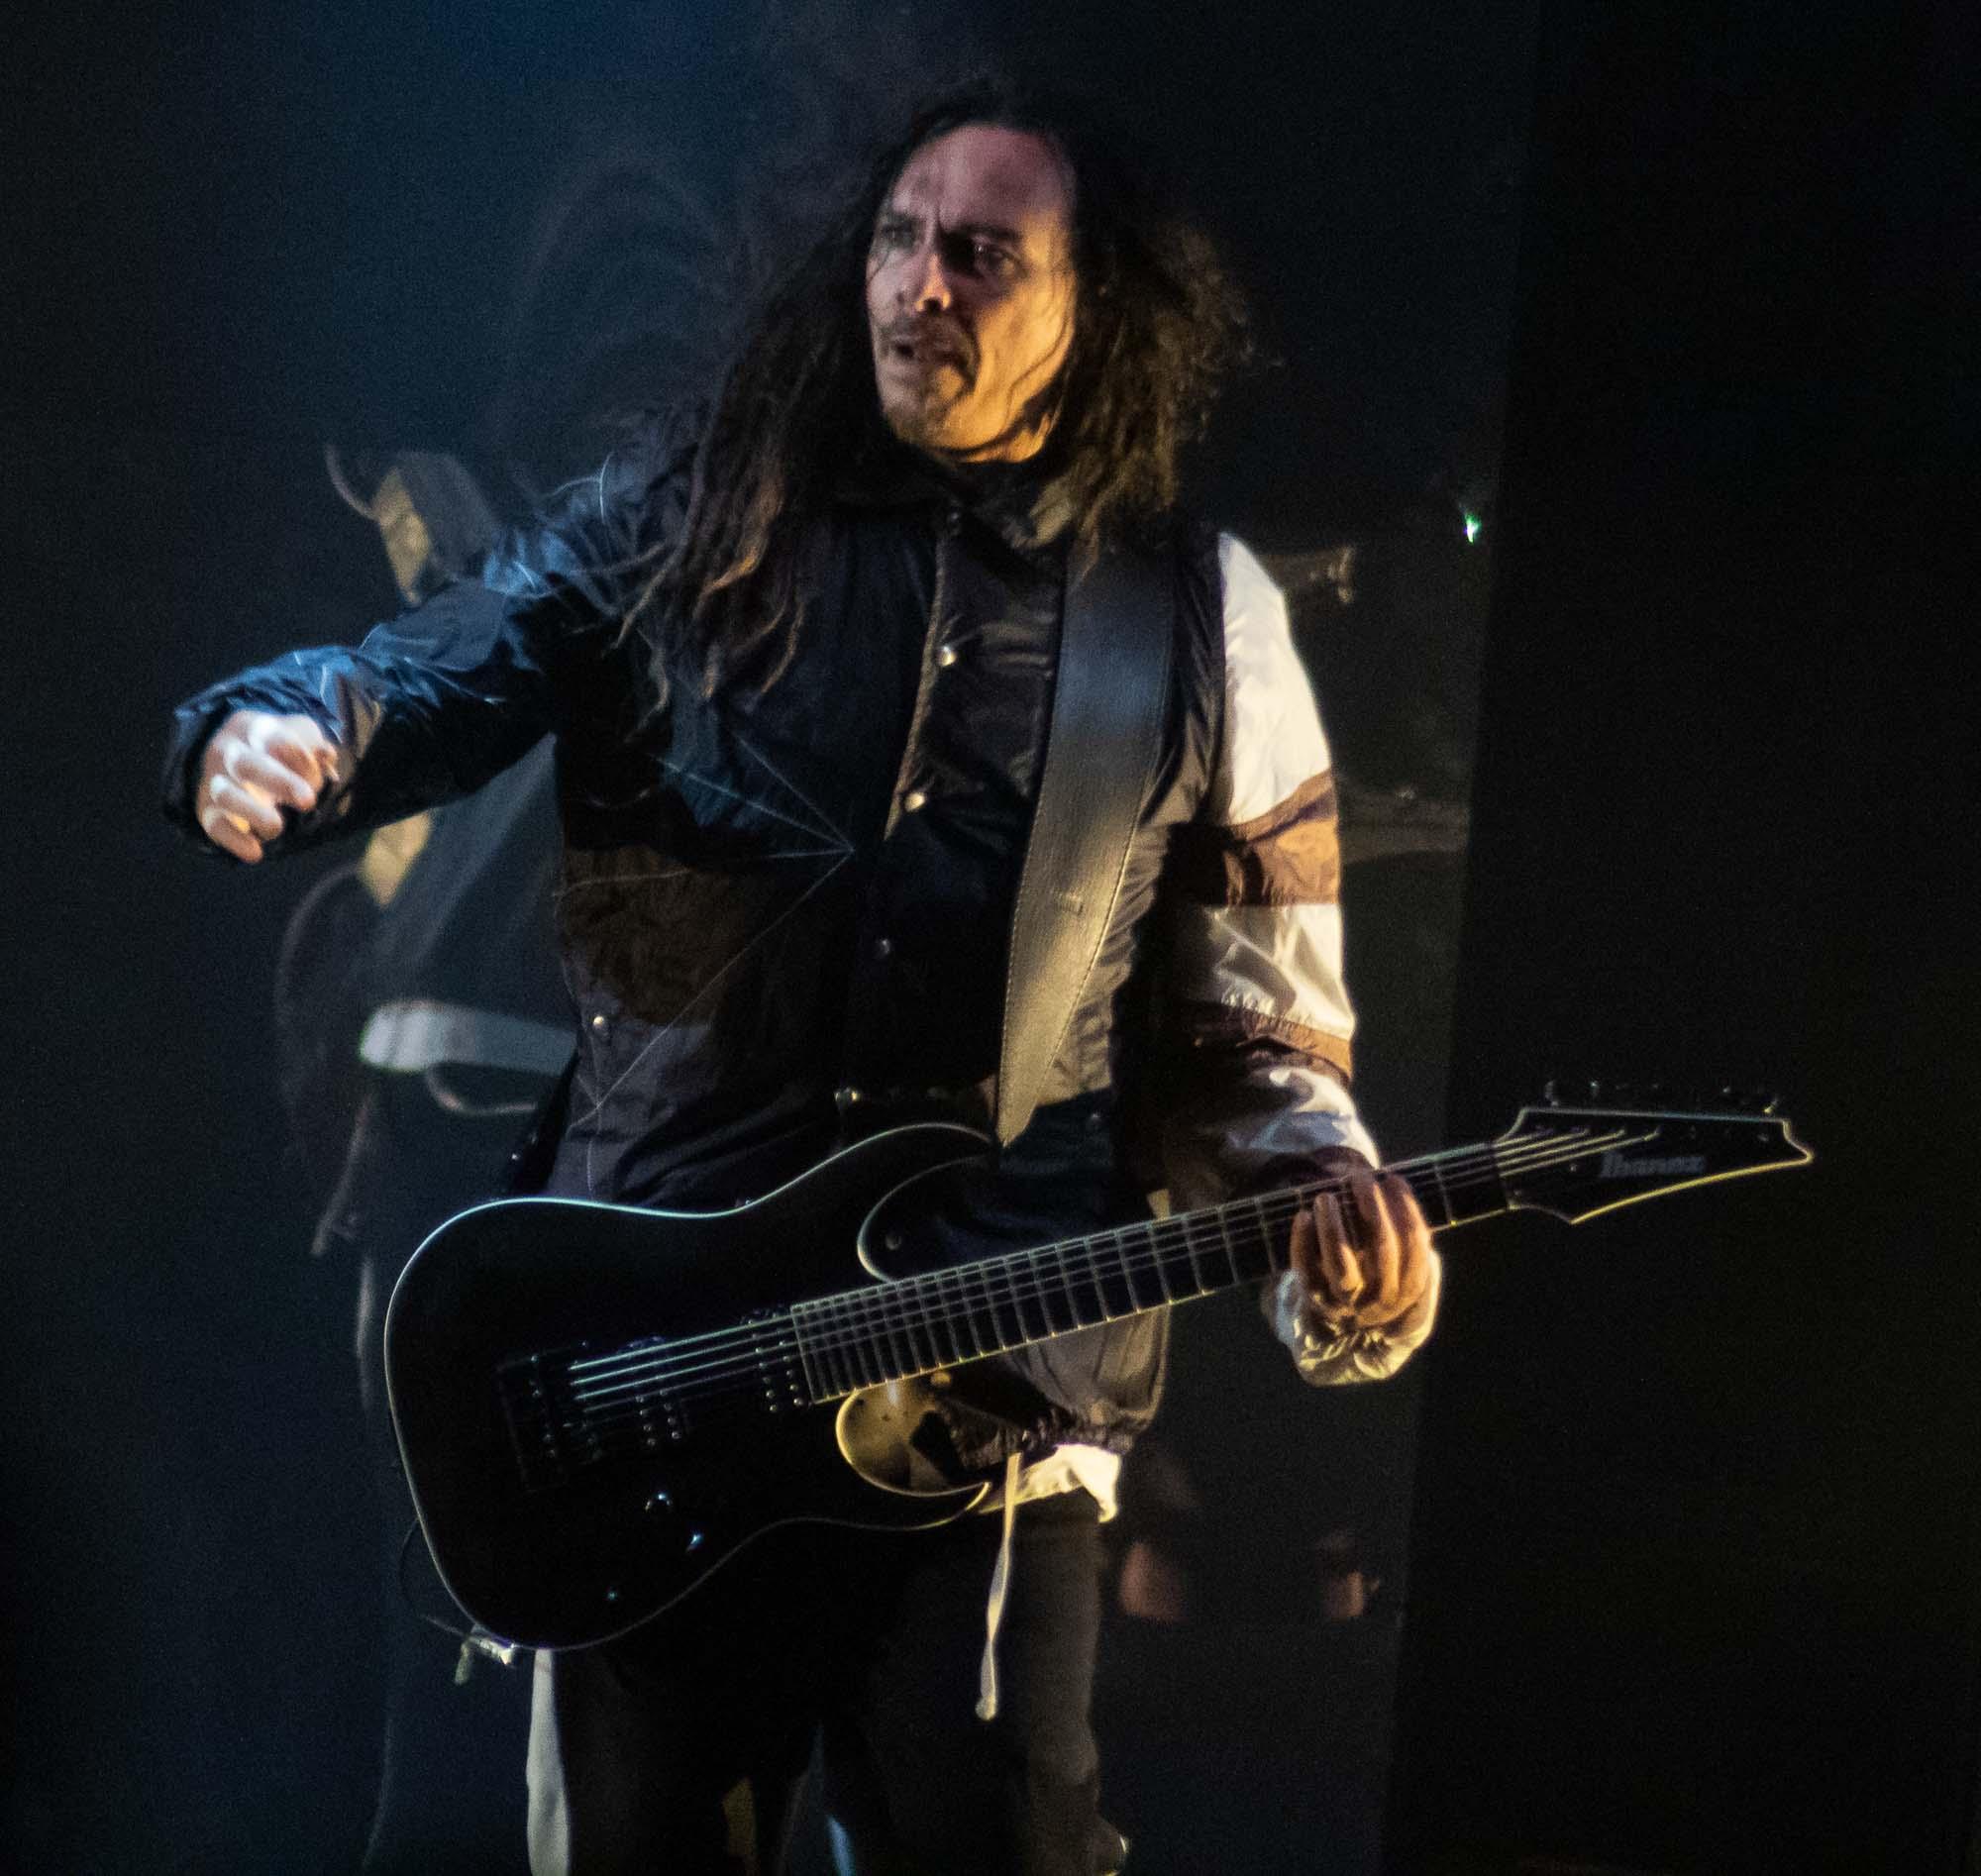 Korn-BudweiserStage-Toronto_Ontario-20190814-JeremyGretzinger12